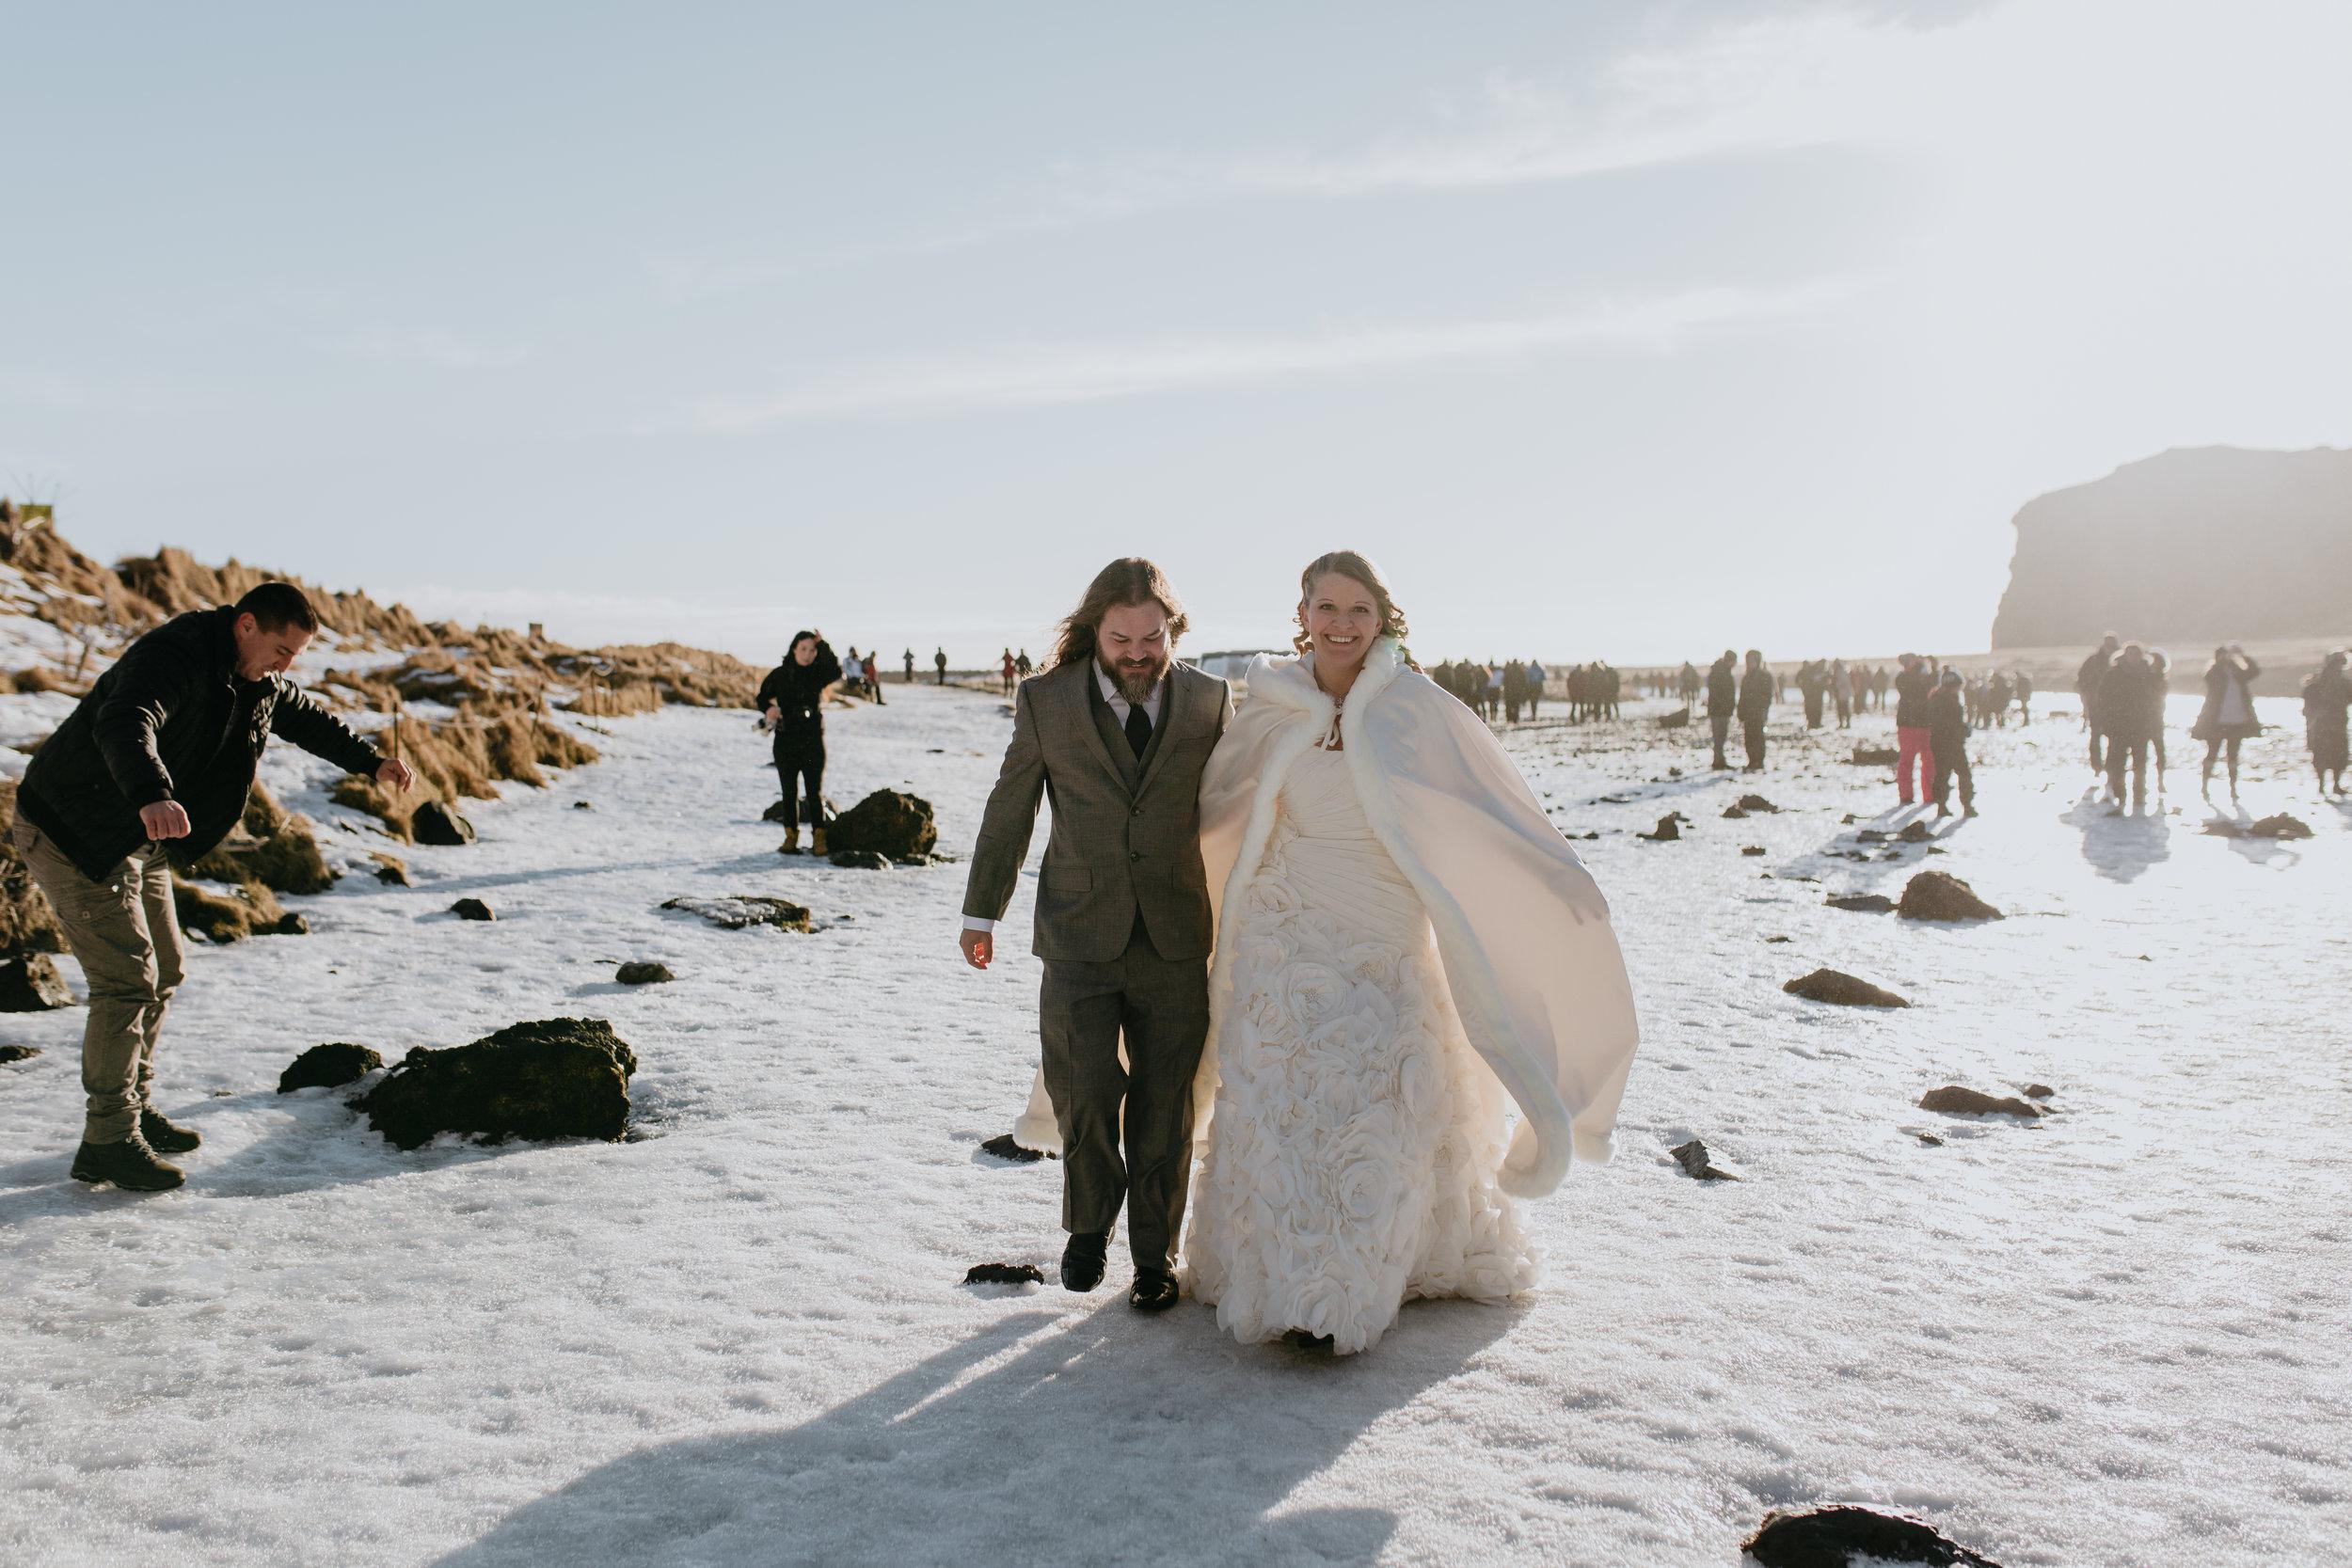 nicole-daacke-photography-iceland-winter-sunset-adventure-elopement-skogafoss-waterfall-black-sand-beach-dyrholaey-vik-iceland-intimate-wedding-black-church-elopement-photographer-6.jpg